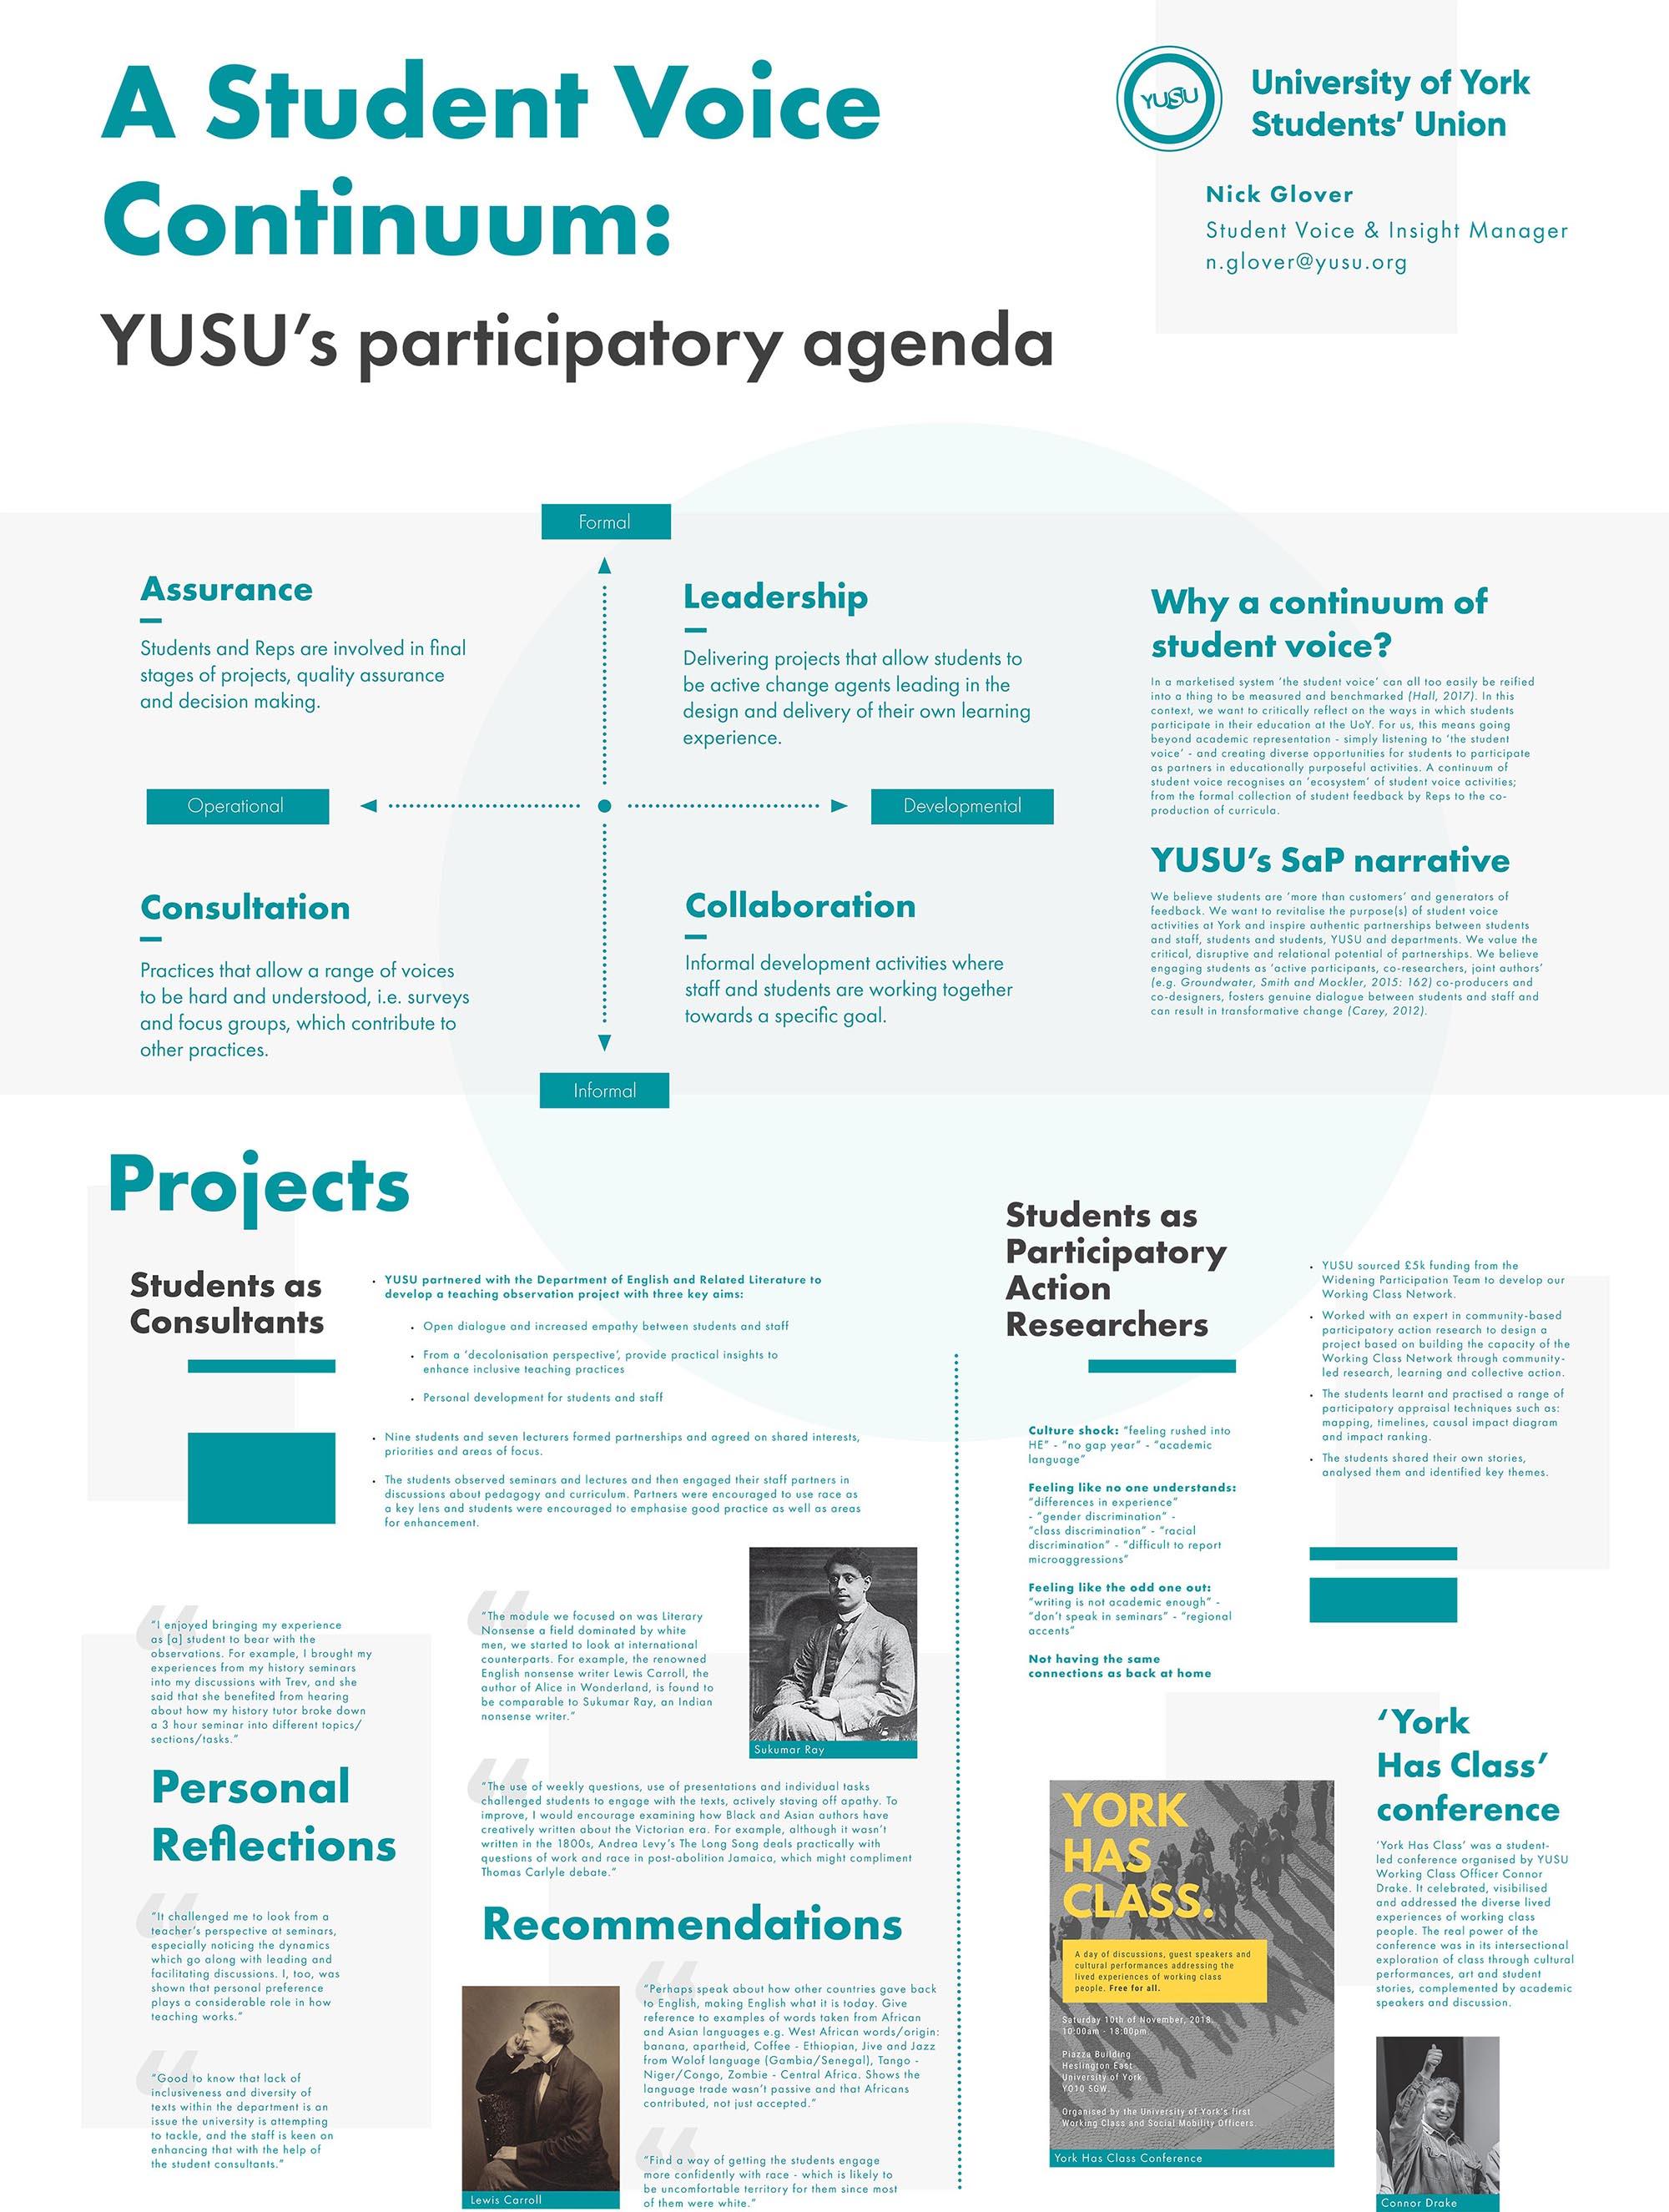 A Student Voice Continuum: YUSU's participatory agenda